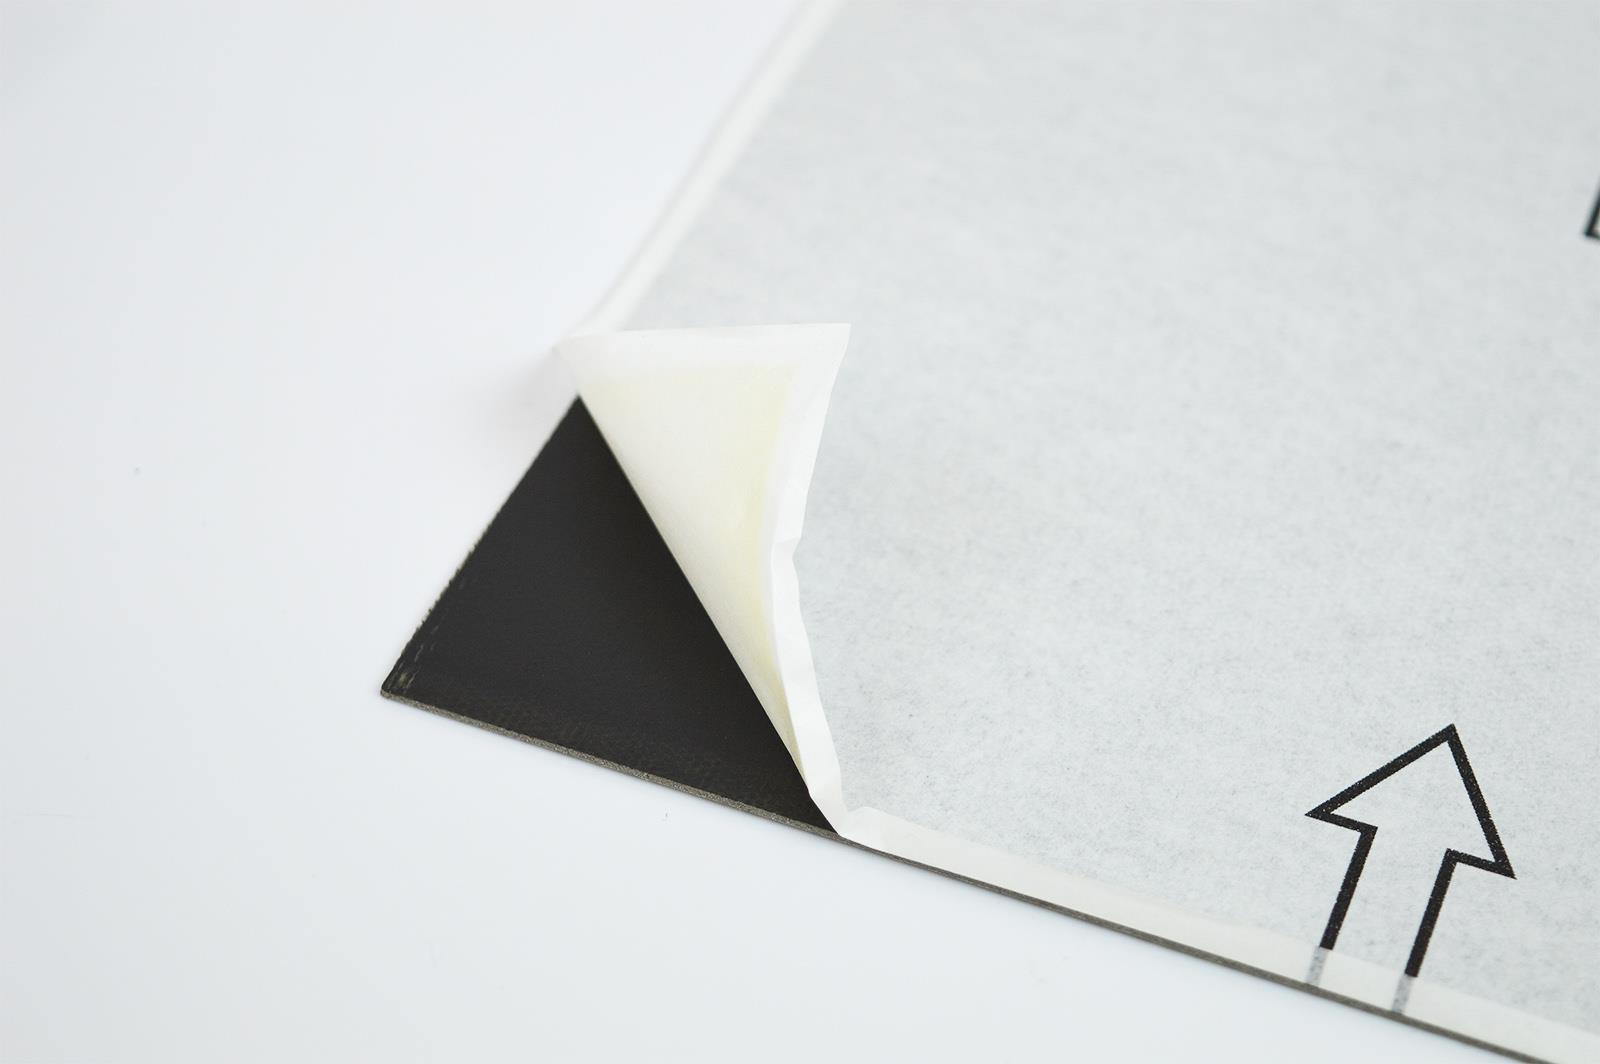 Floor-Tiles-Self-Adhesive-Vinyl-Flooring-Kitchen-Bathroom-Brown-Wood-Grain thumbnail 26